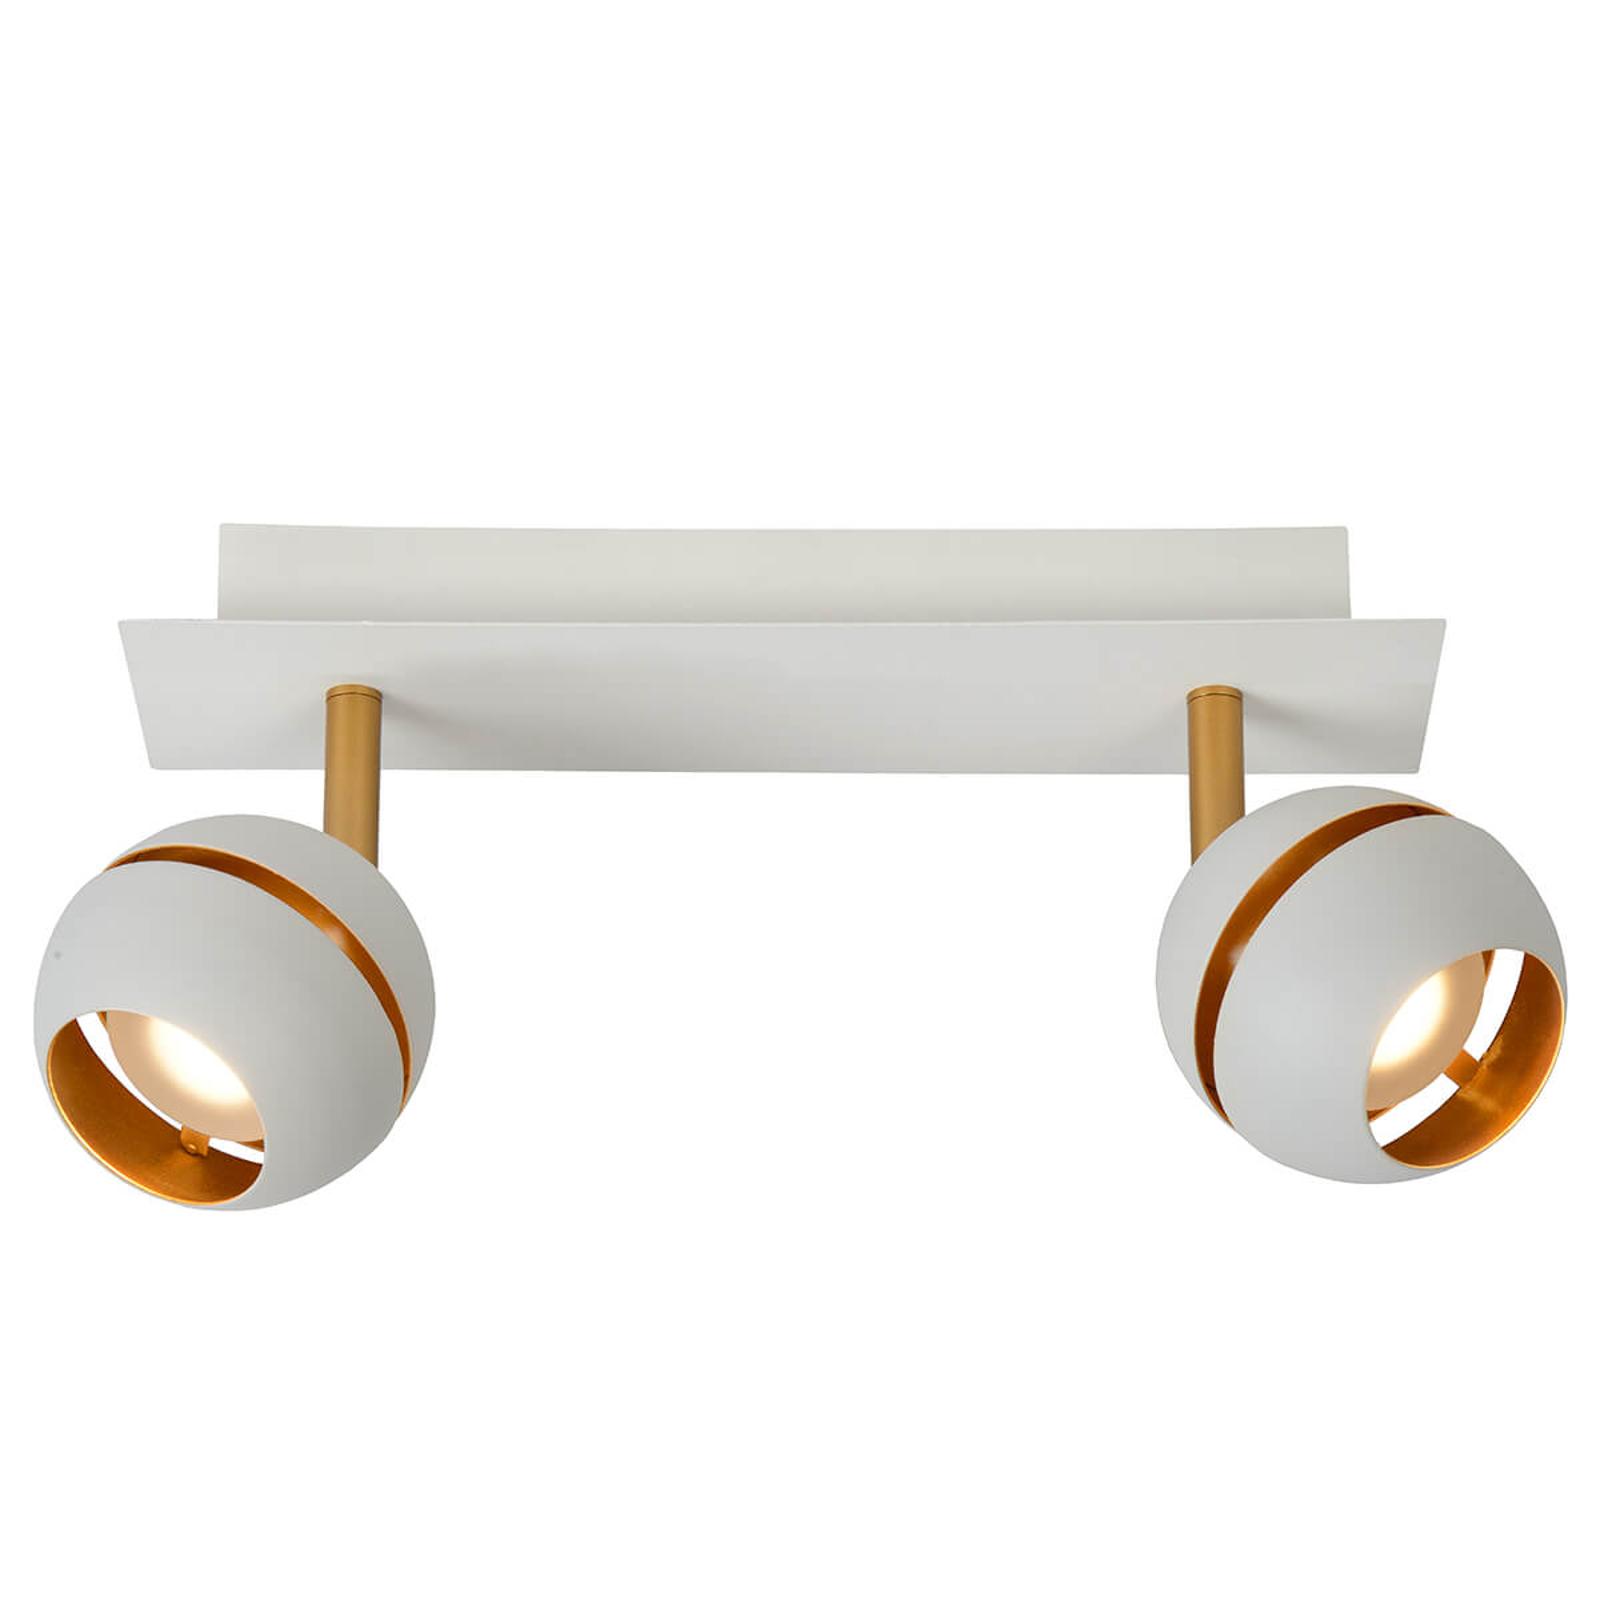 LED plafondlamp Binari, 2-lamps, wit